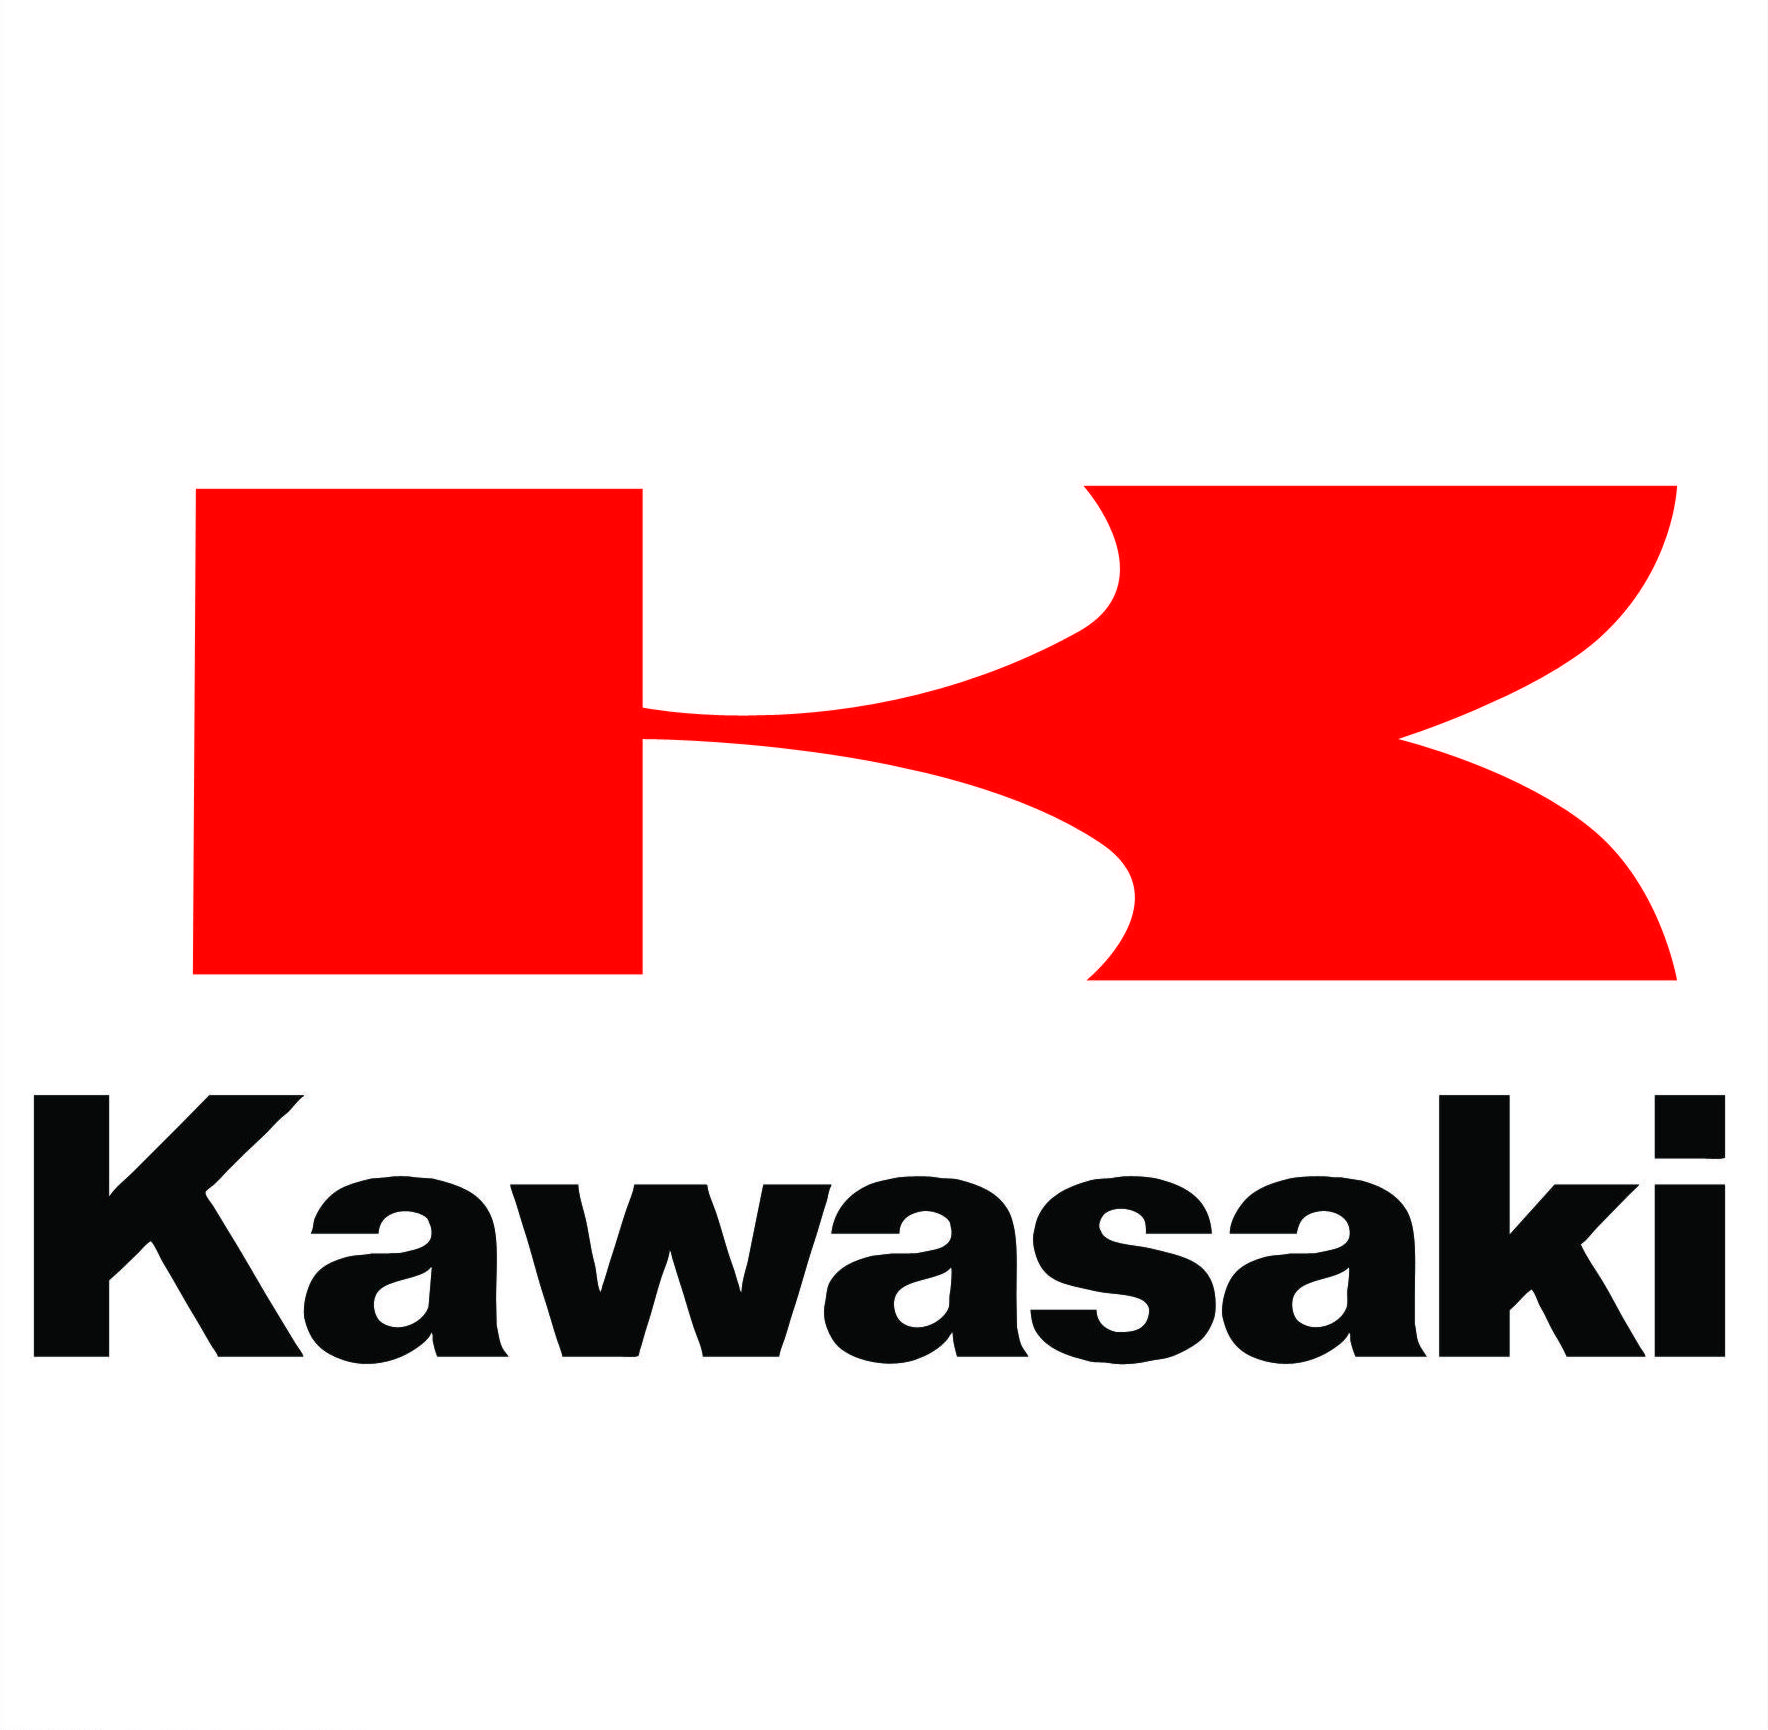 kawasaki logos manic moto rh manicmotorcycle com kawasaki logo images kawasaki logo images